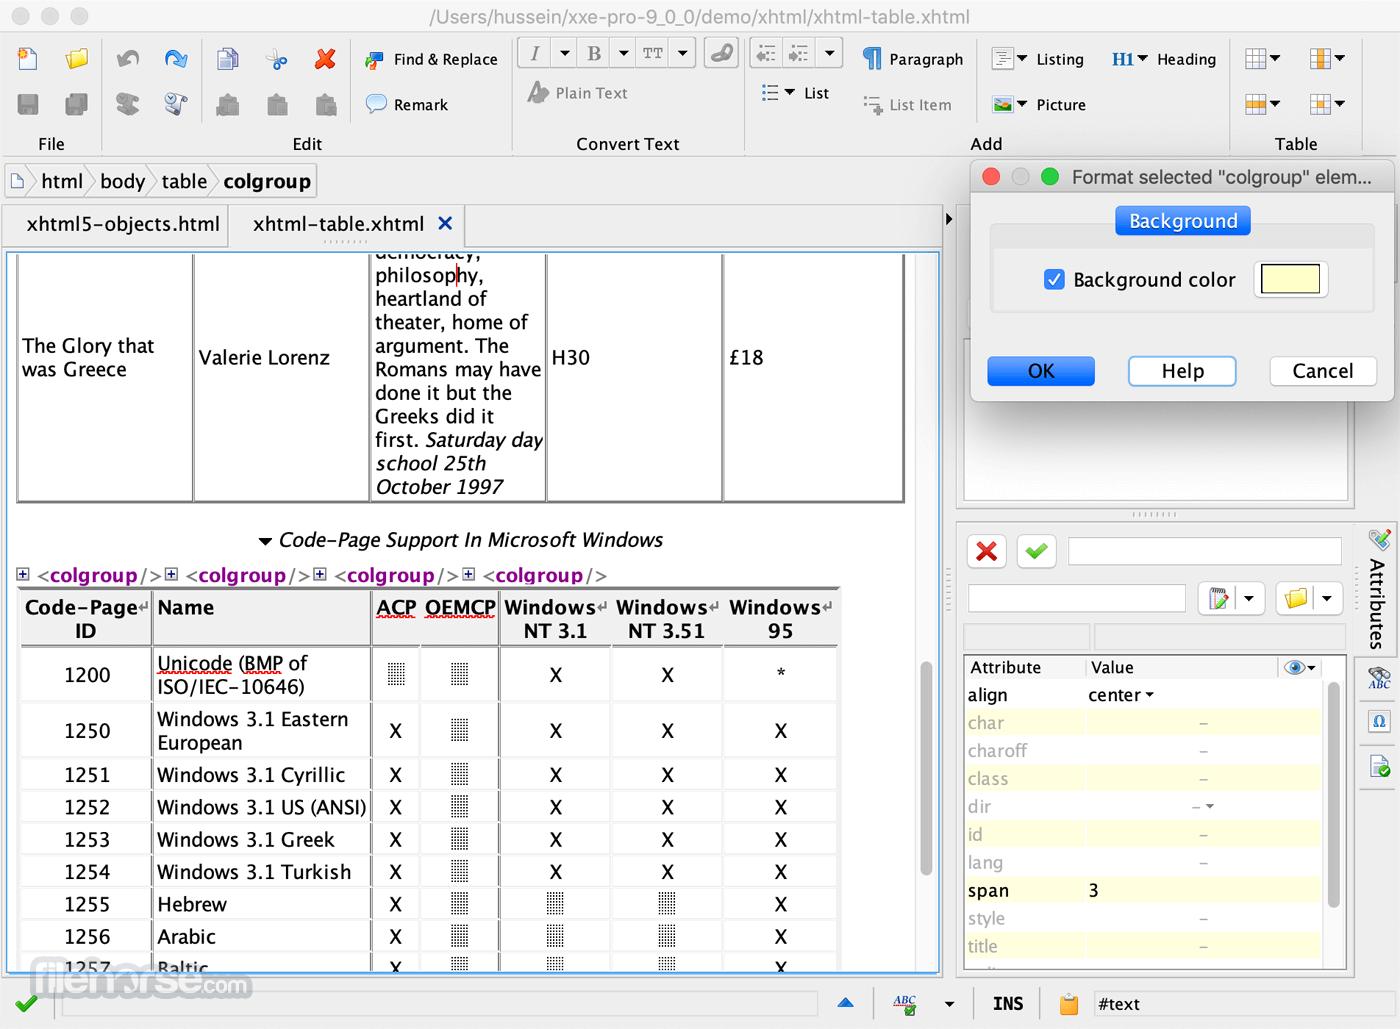 XMLmind XML Editor 9.5.0 Captura de Pantalla 2